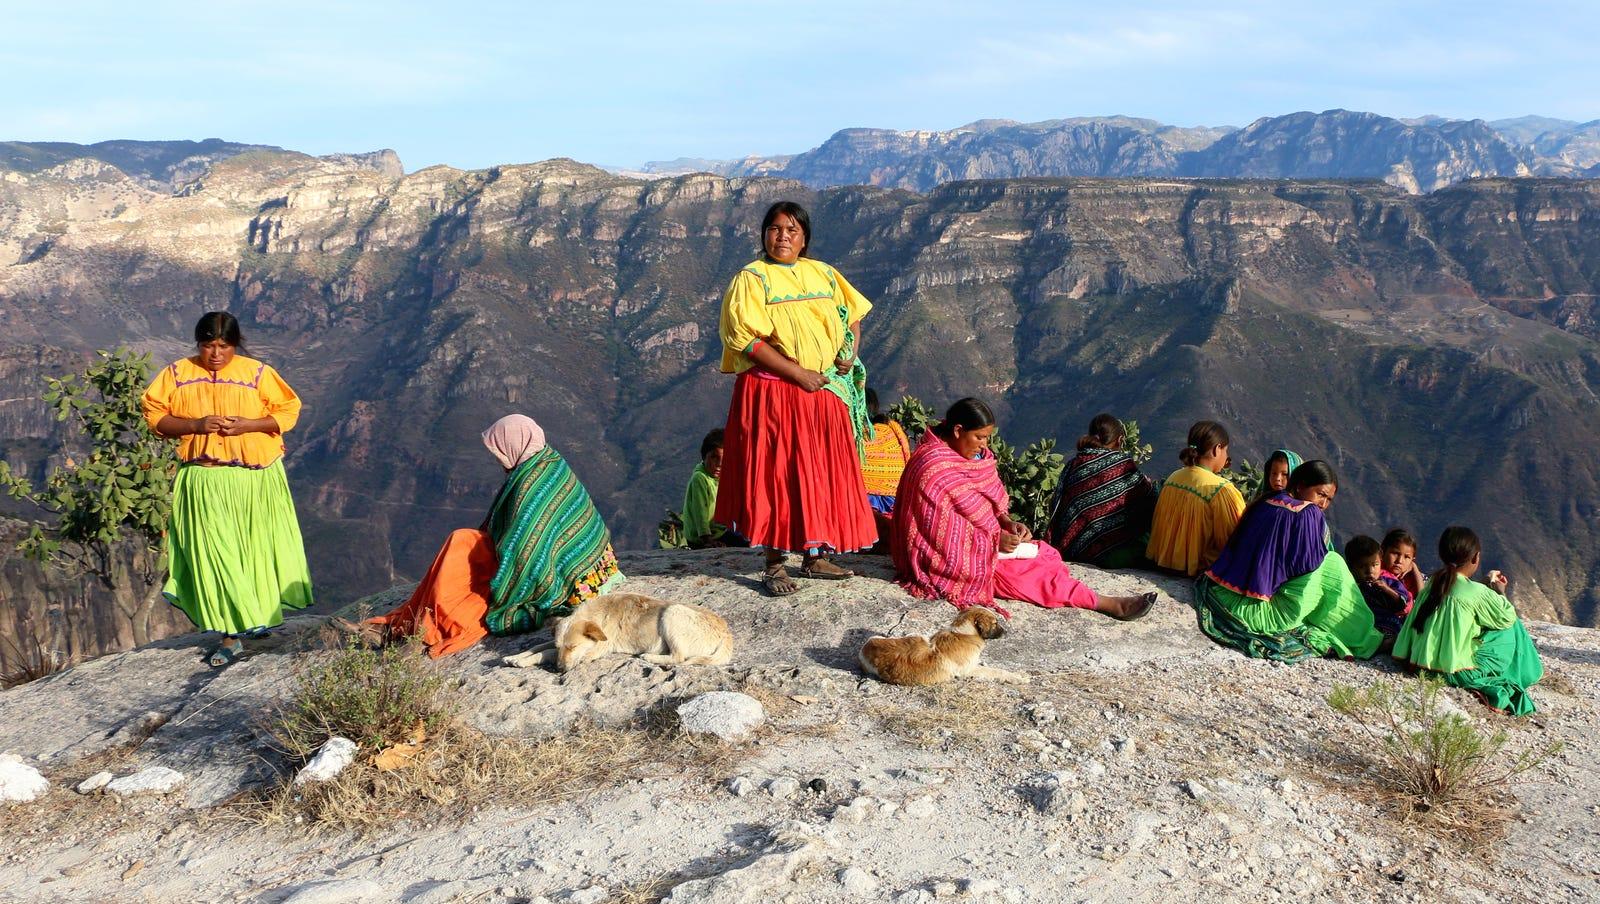 Free Saturday race in San Elizario will benefit Raramuri communities in Mexico